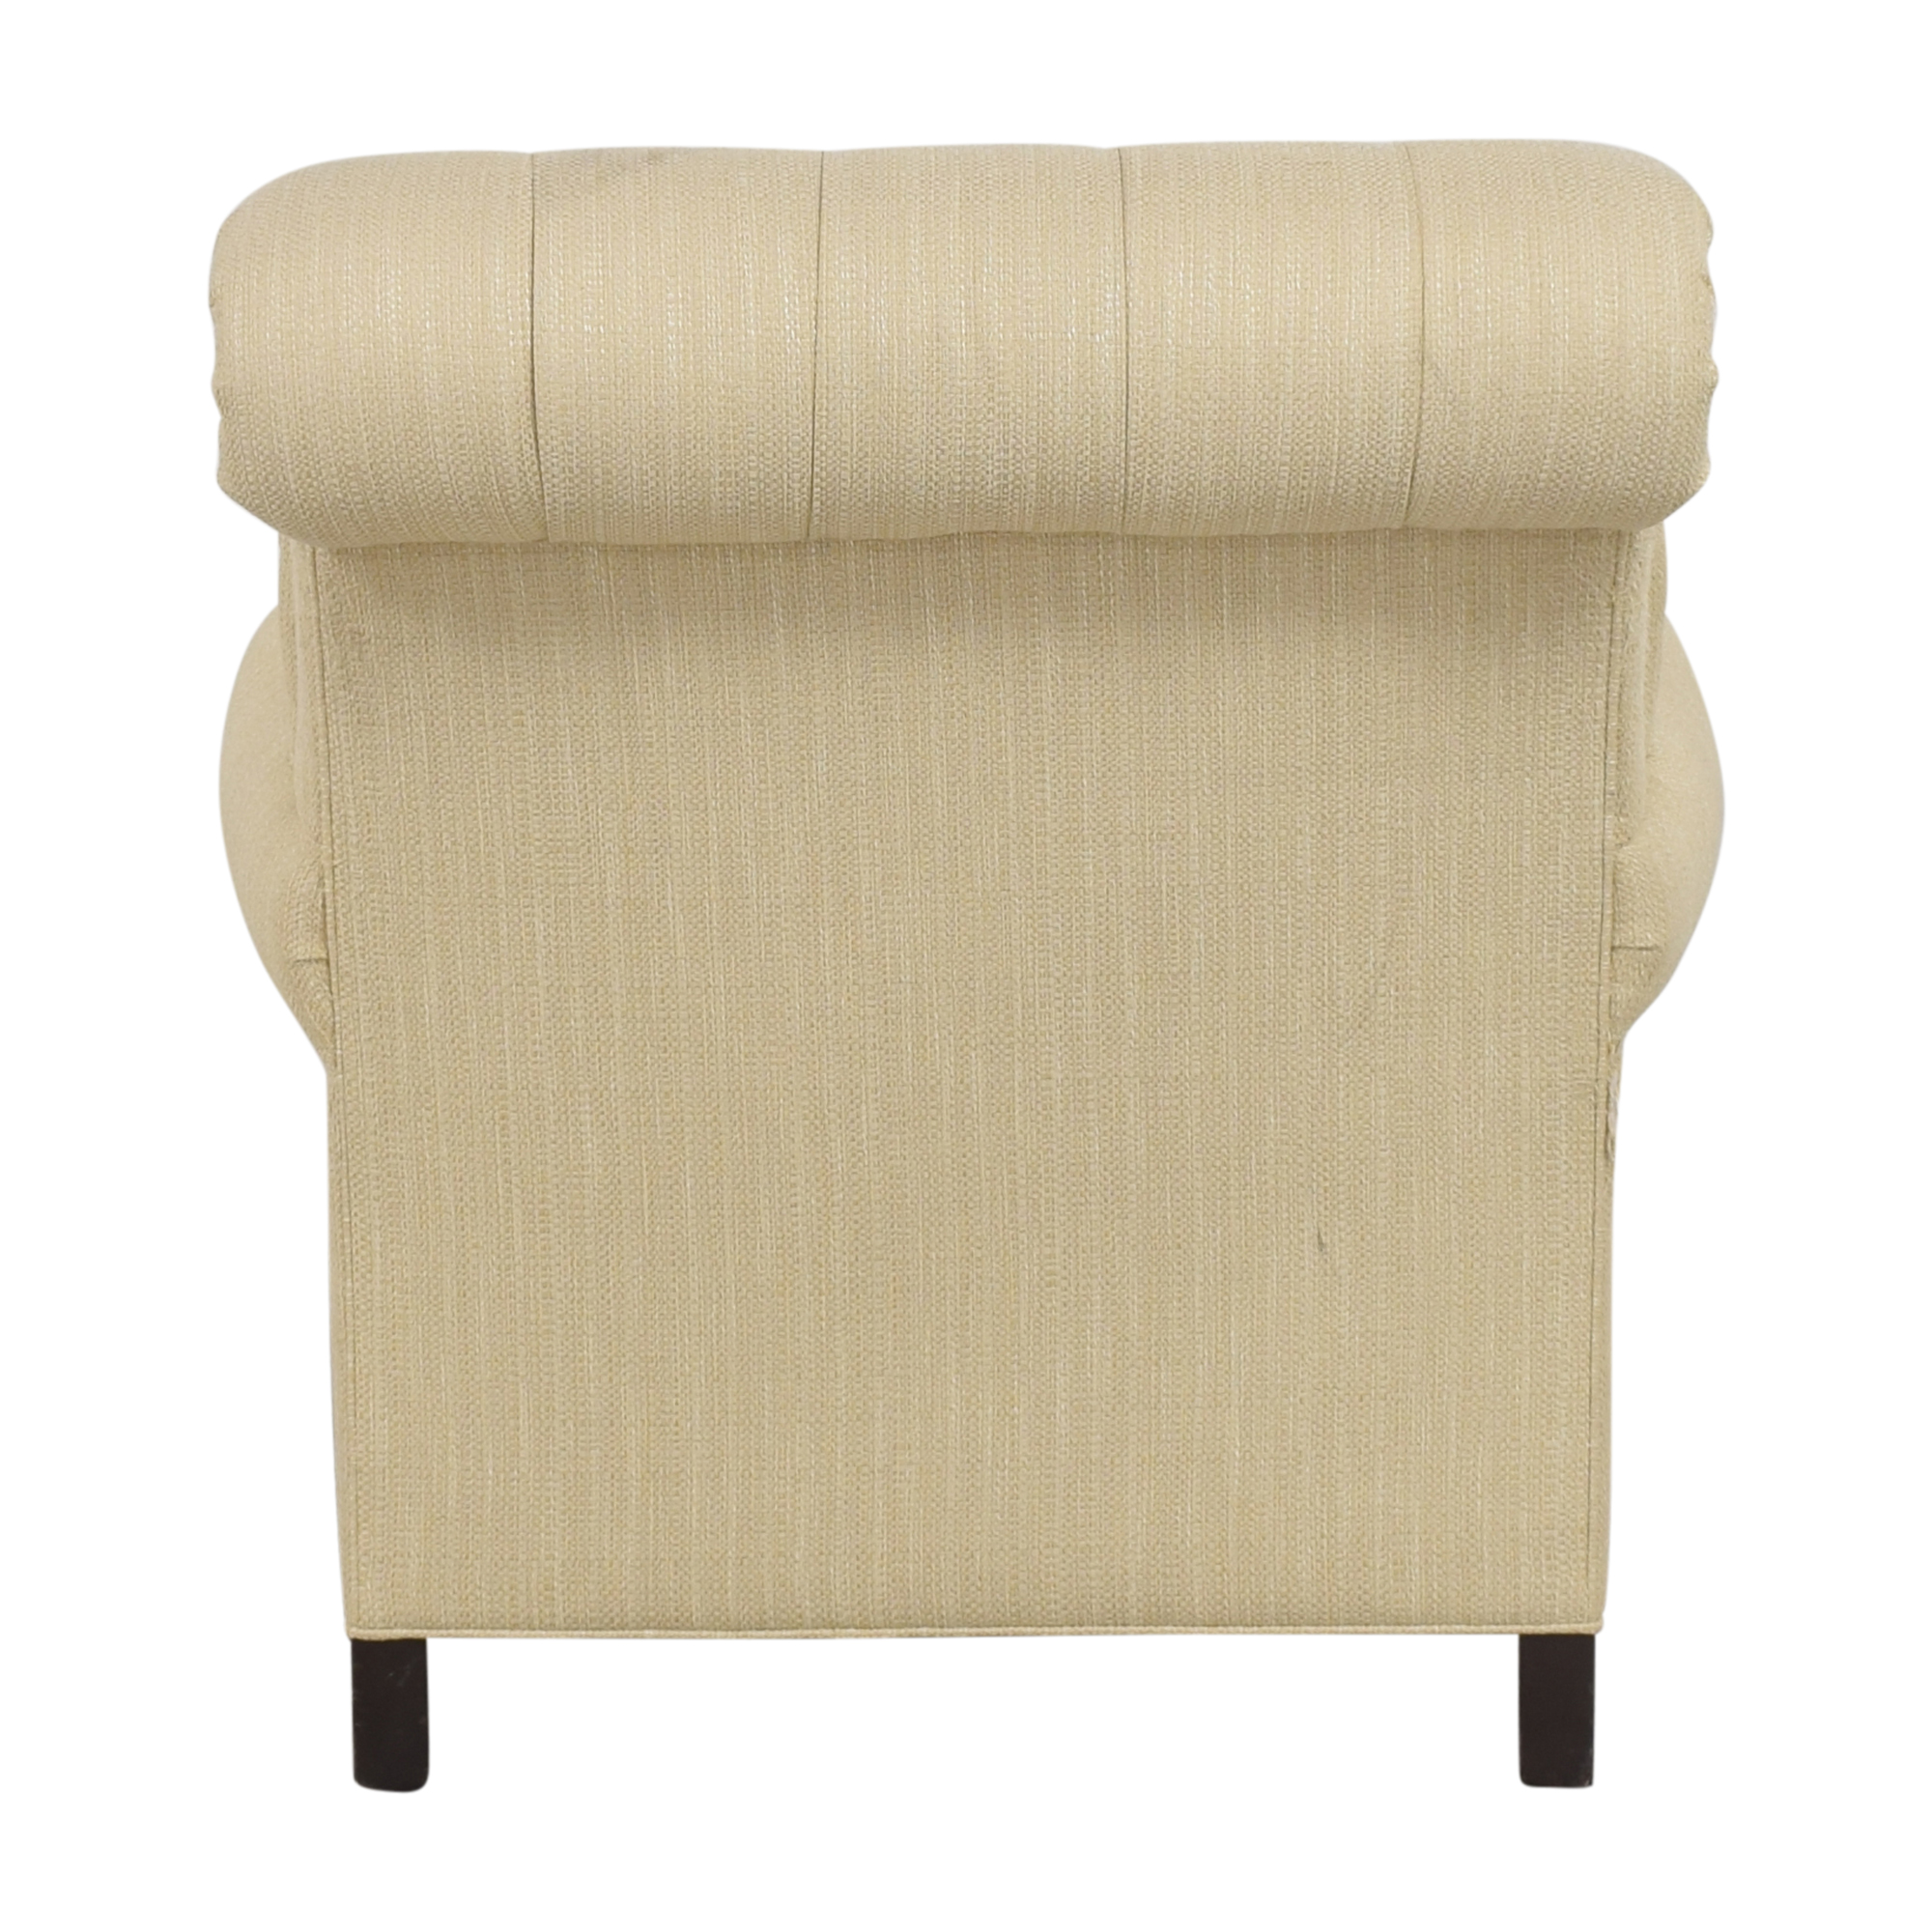 buy Ethan Allen Shawe Chair Ethan Allen Chairs